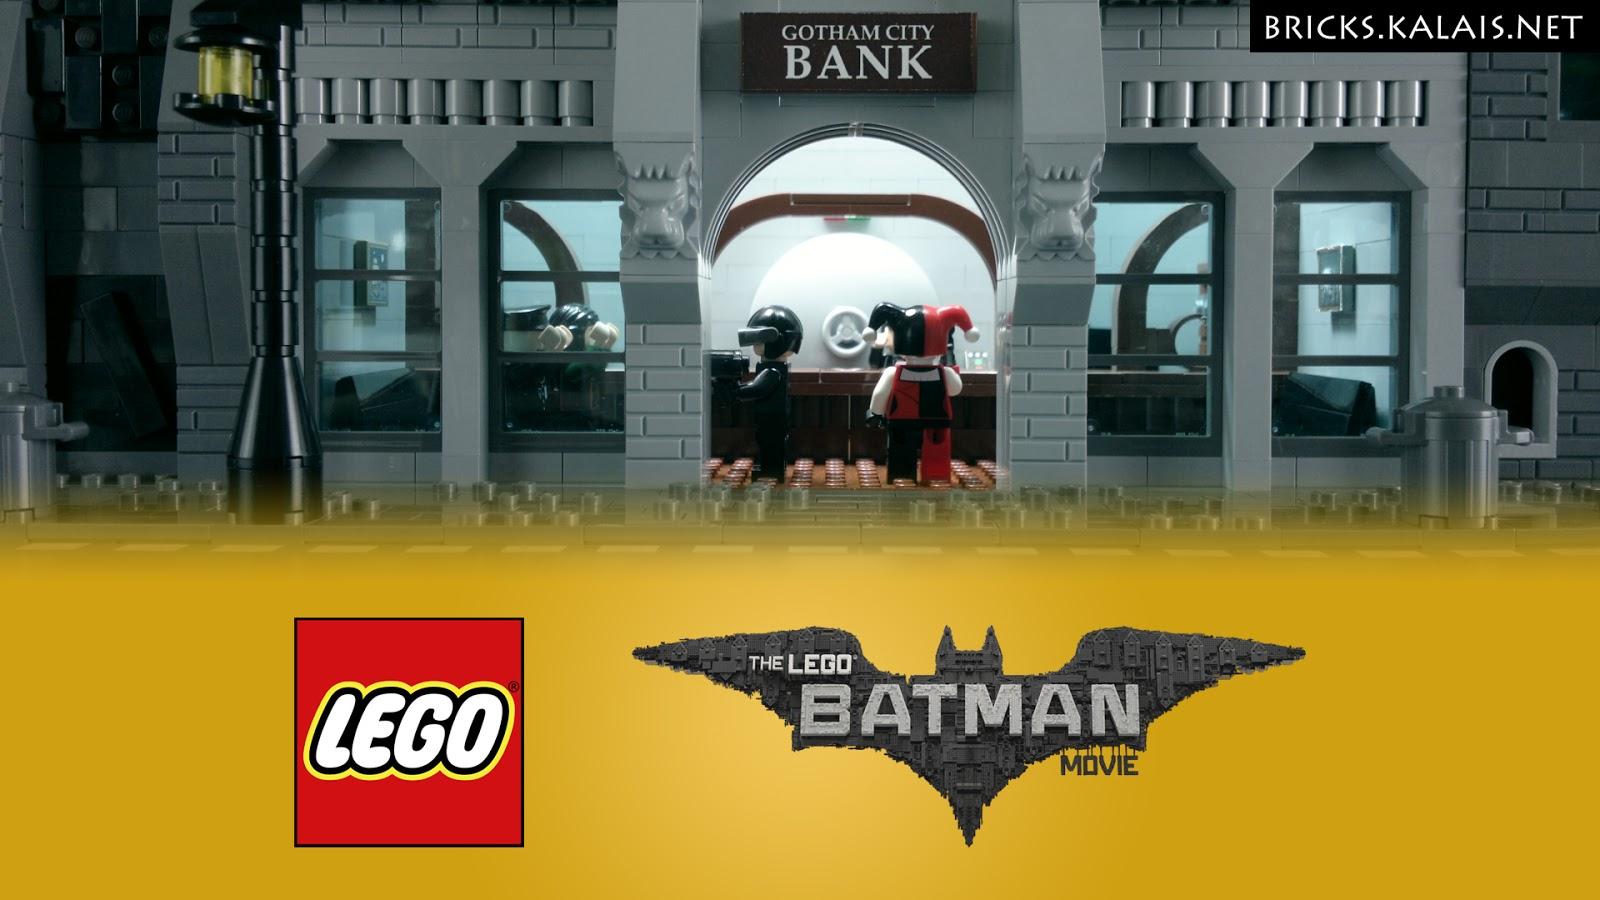 [Brickfilm] Harley Quinn robs a Gotham Bank